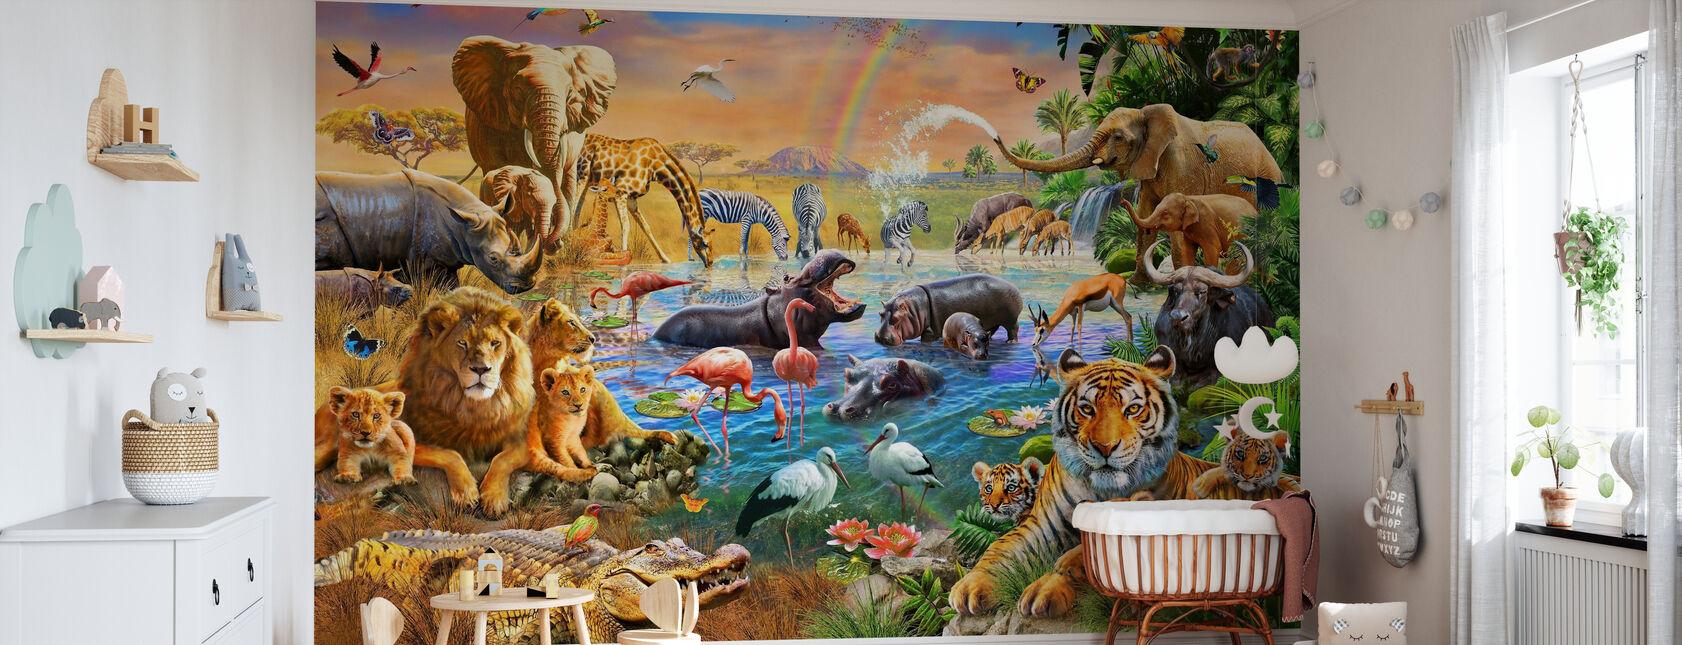 Savannah Jungle Waterhole - Wallpaper - Nursery